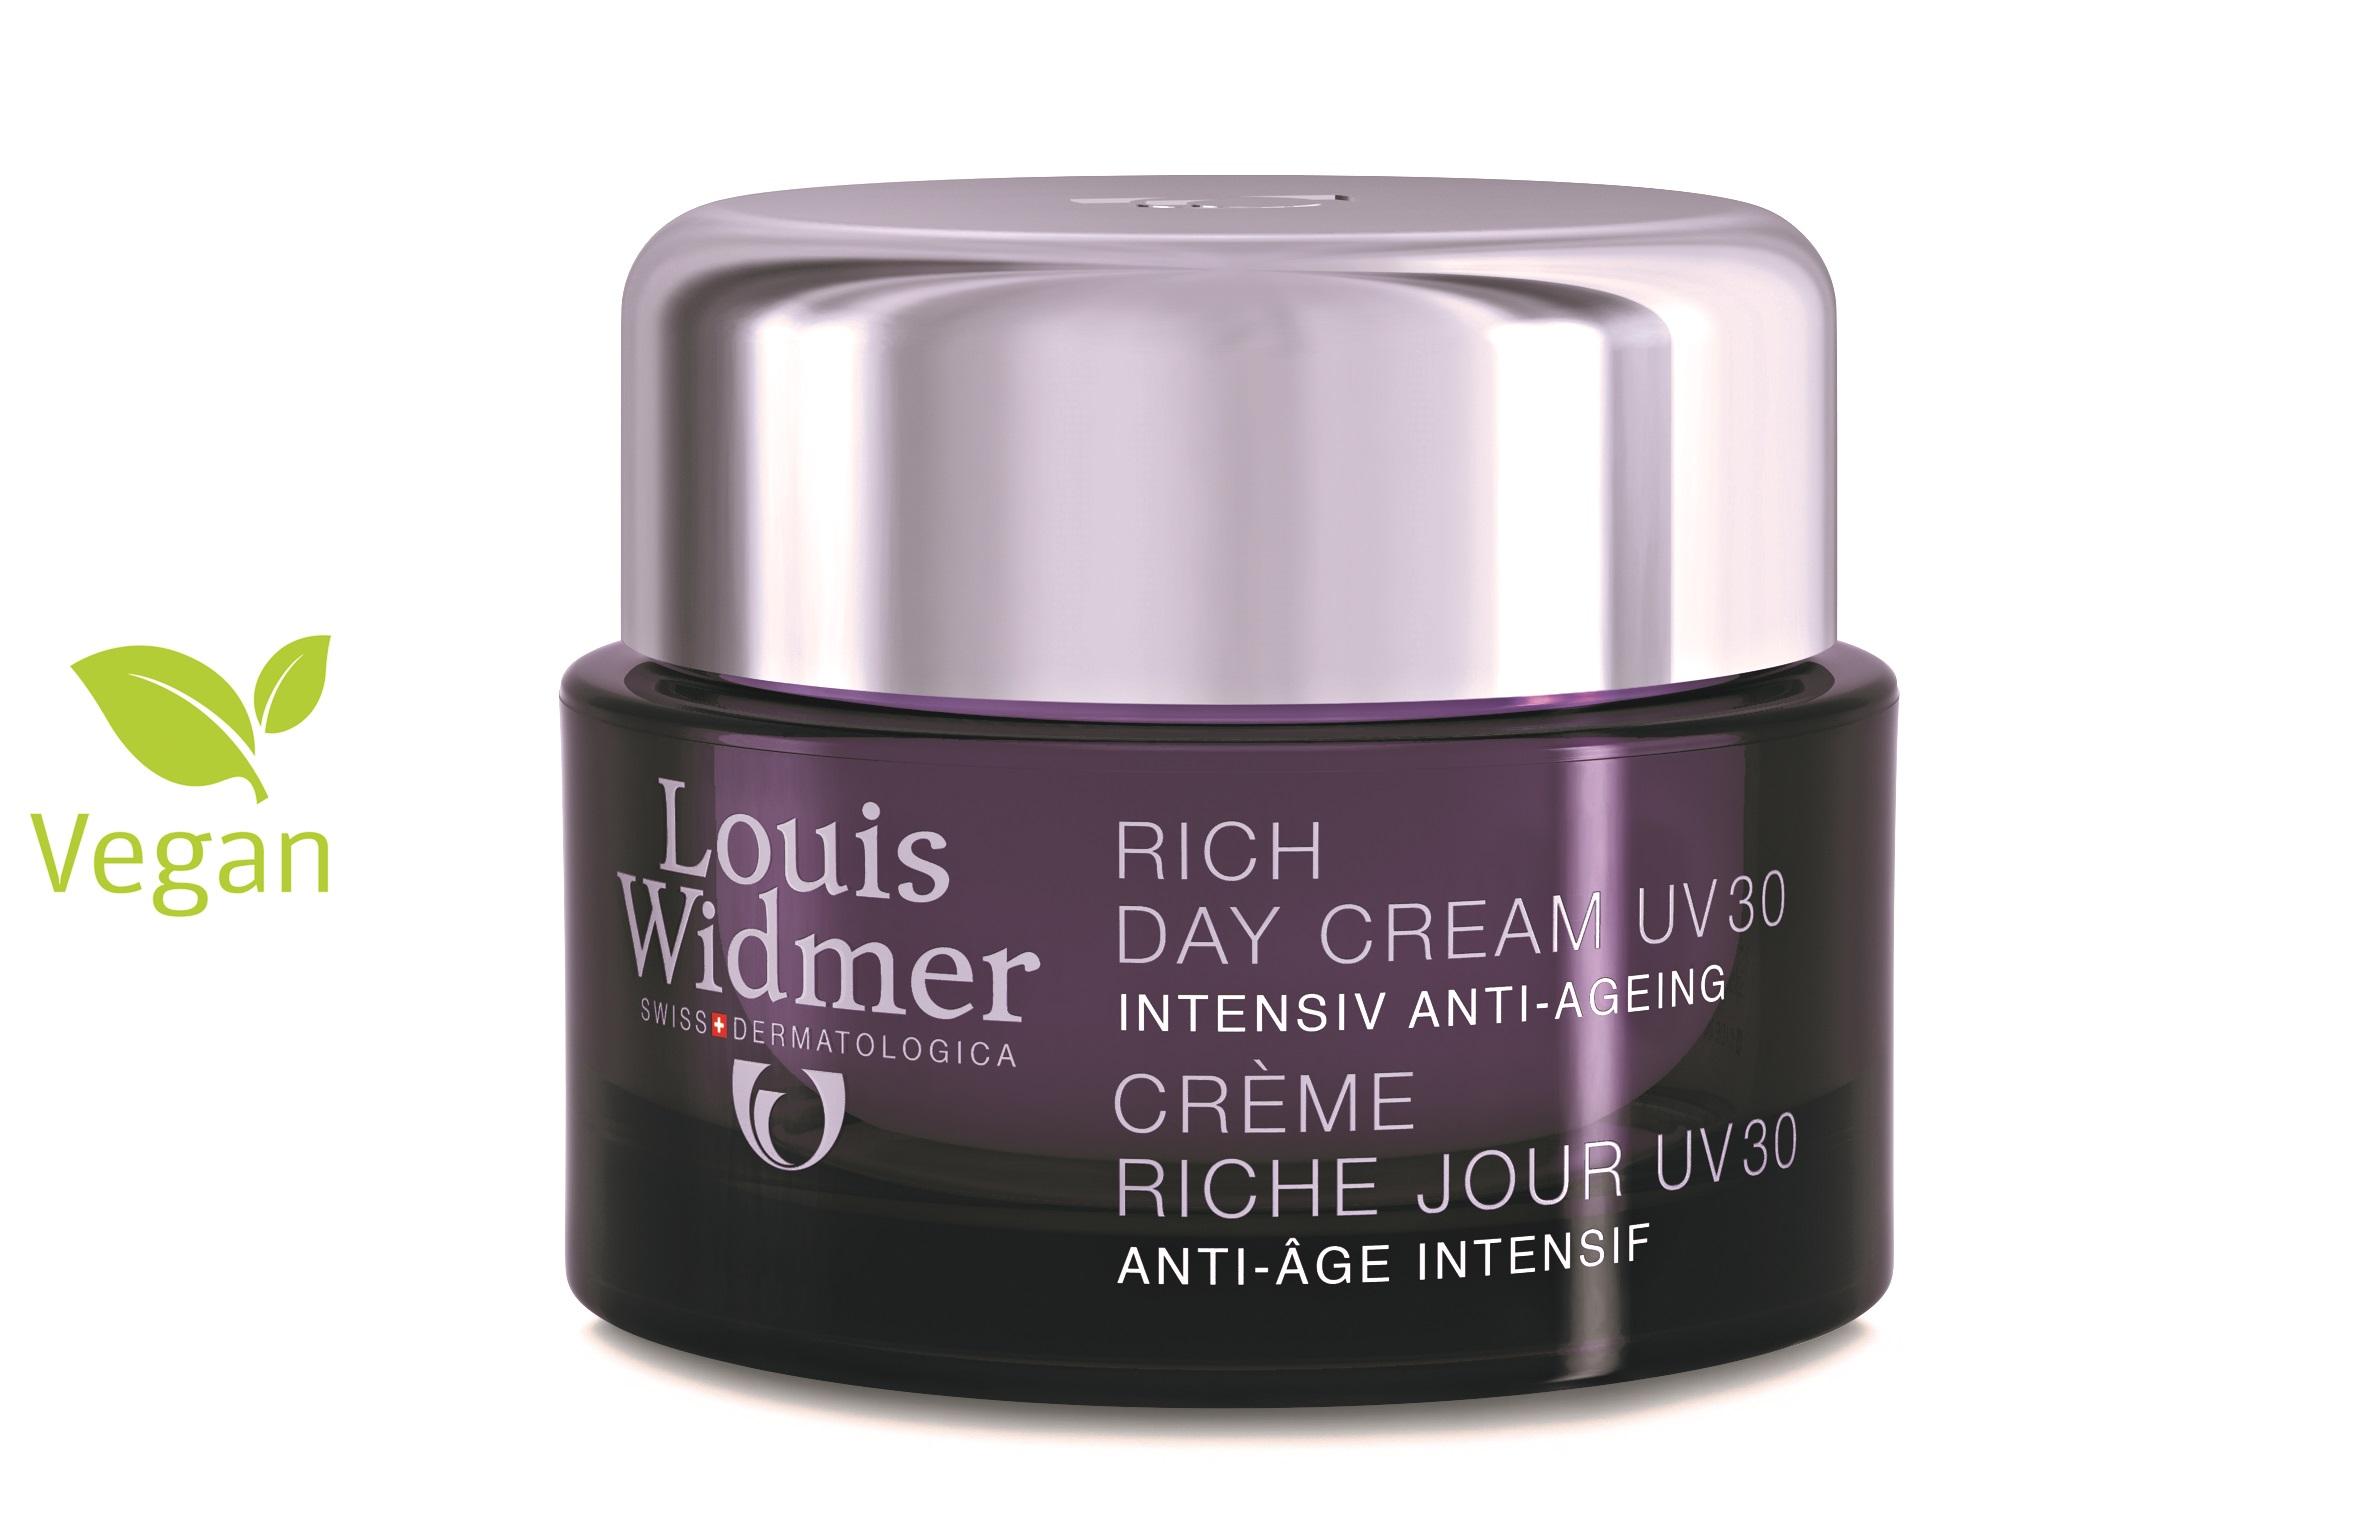 Widmer Rich Day Cream UV 30